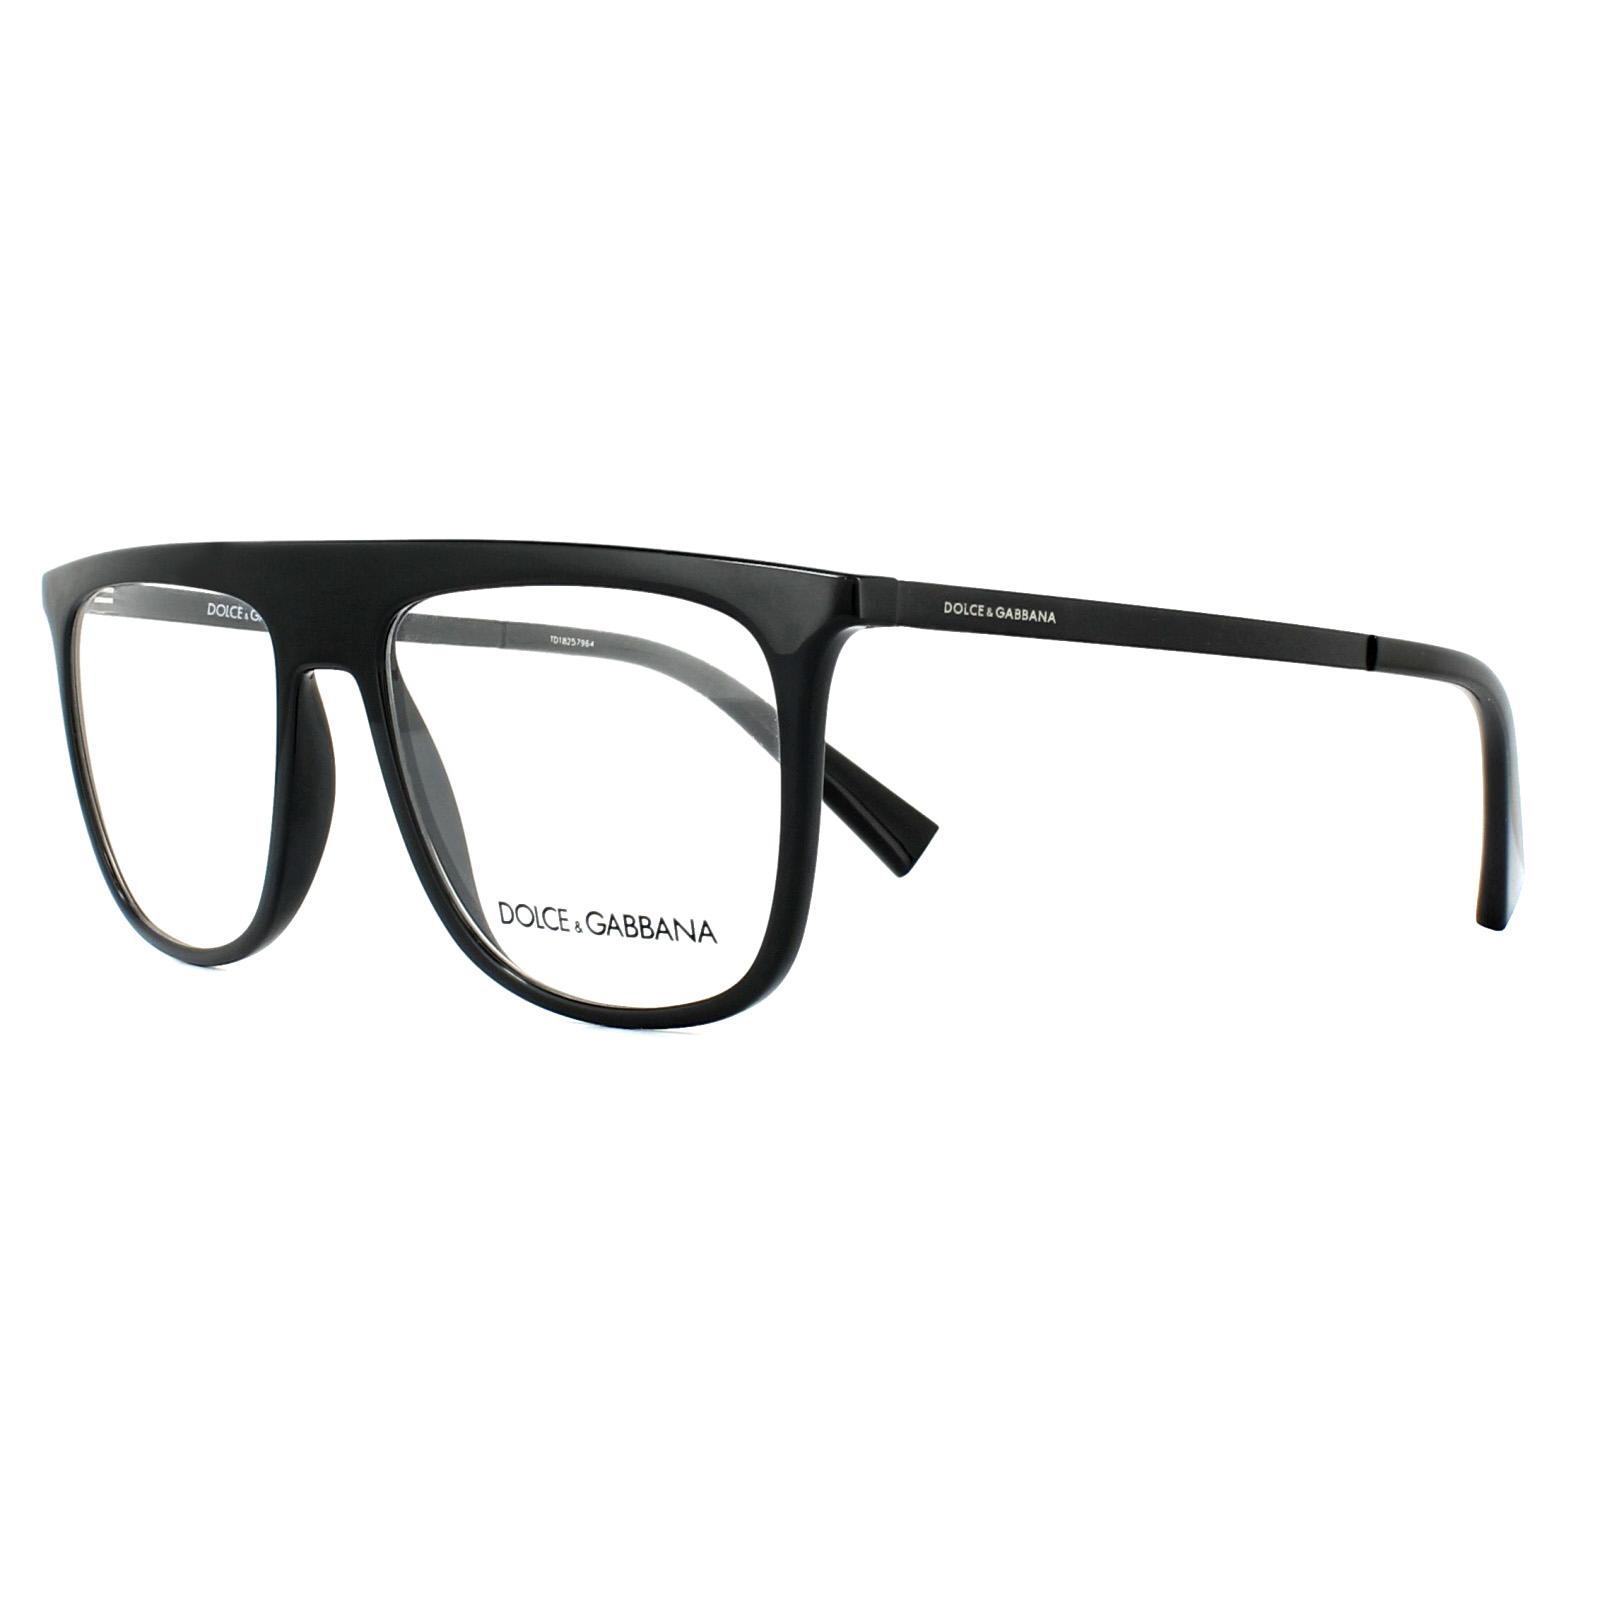 ba7cf36dfc Sentinel Dolce   Gabbana Glasses Frames DG 5022 501 Black 53mm Mens